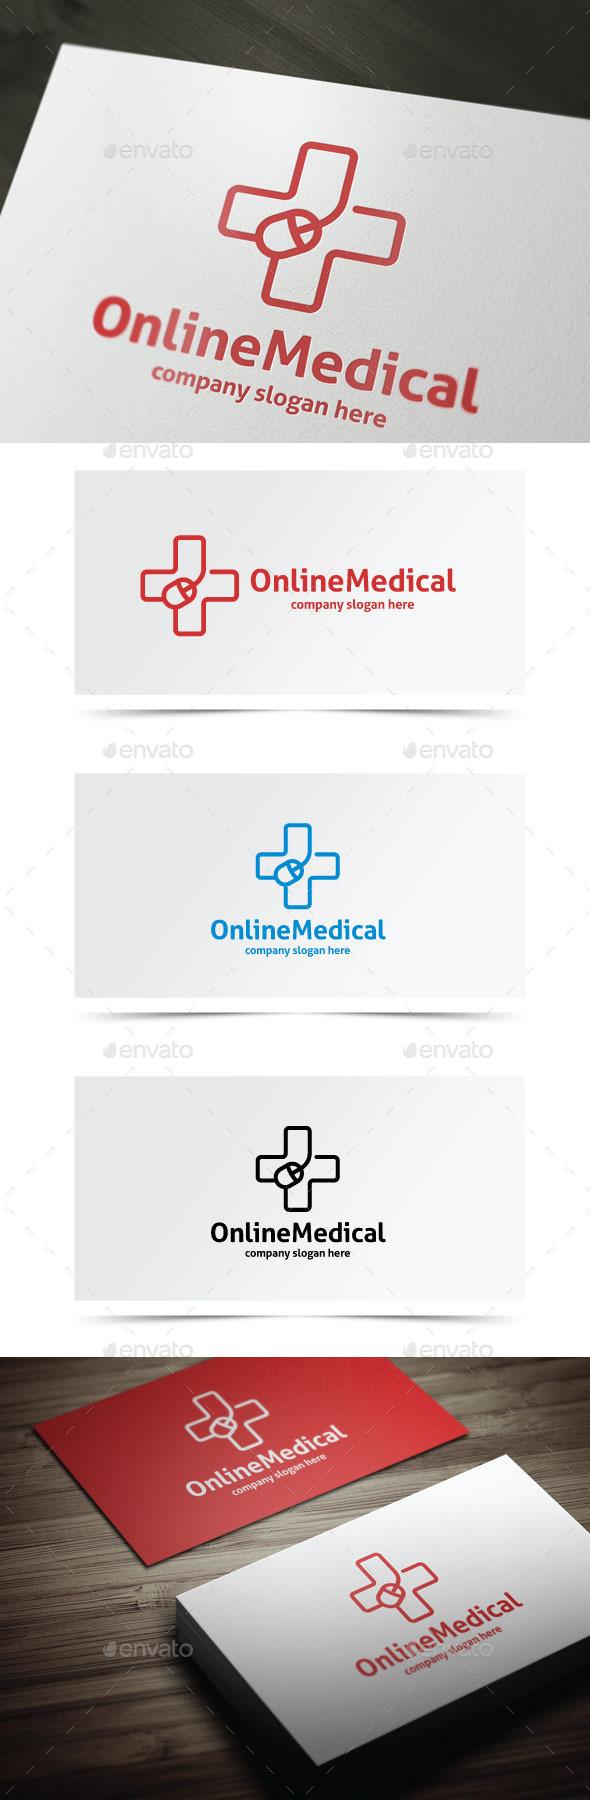 Online Medical - Symbols Logo Templates